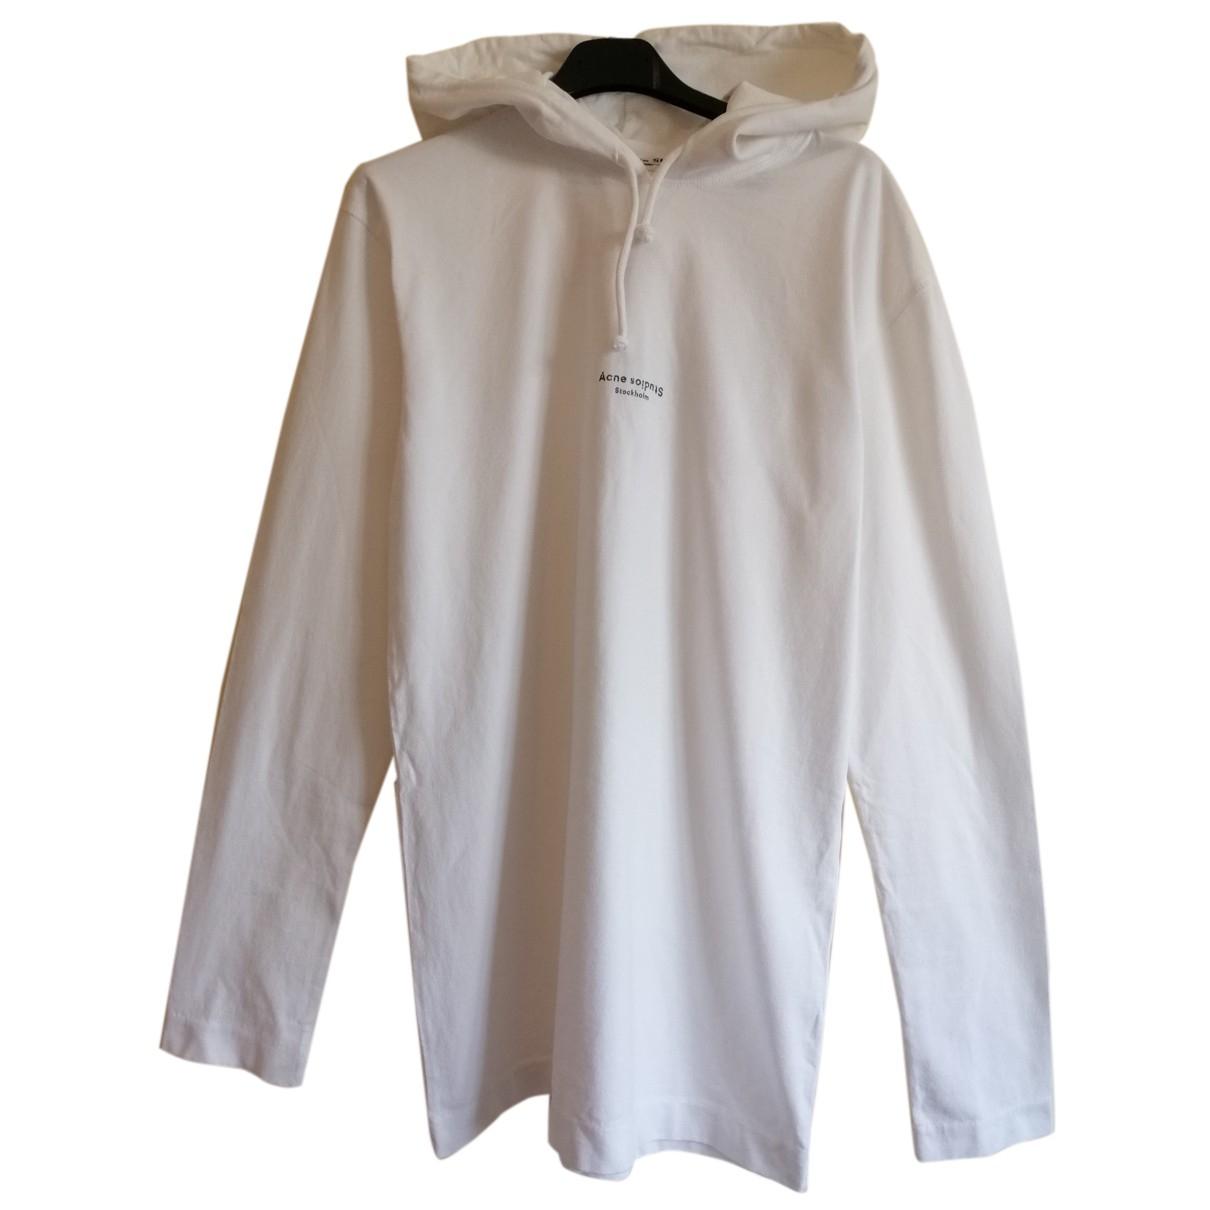 Acne Studios N White Cotton Knitwear & Sweatshirts for Men S International